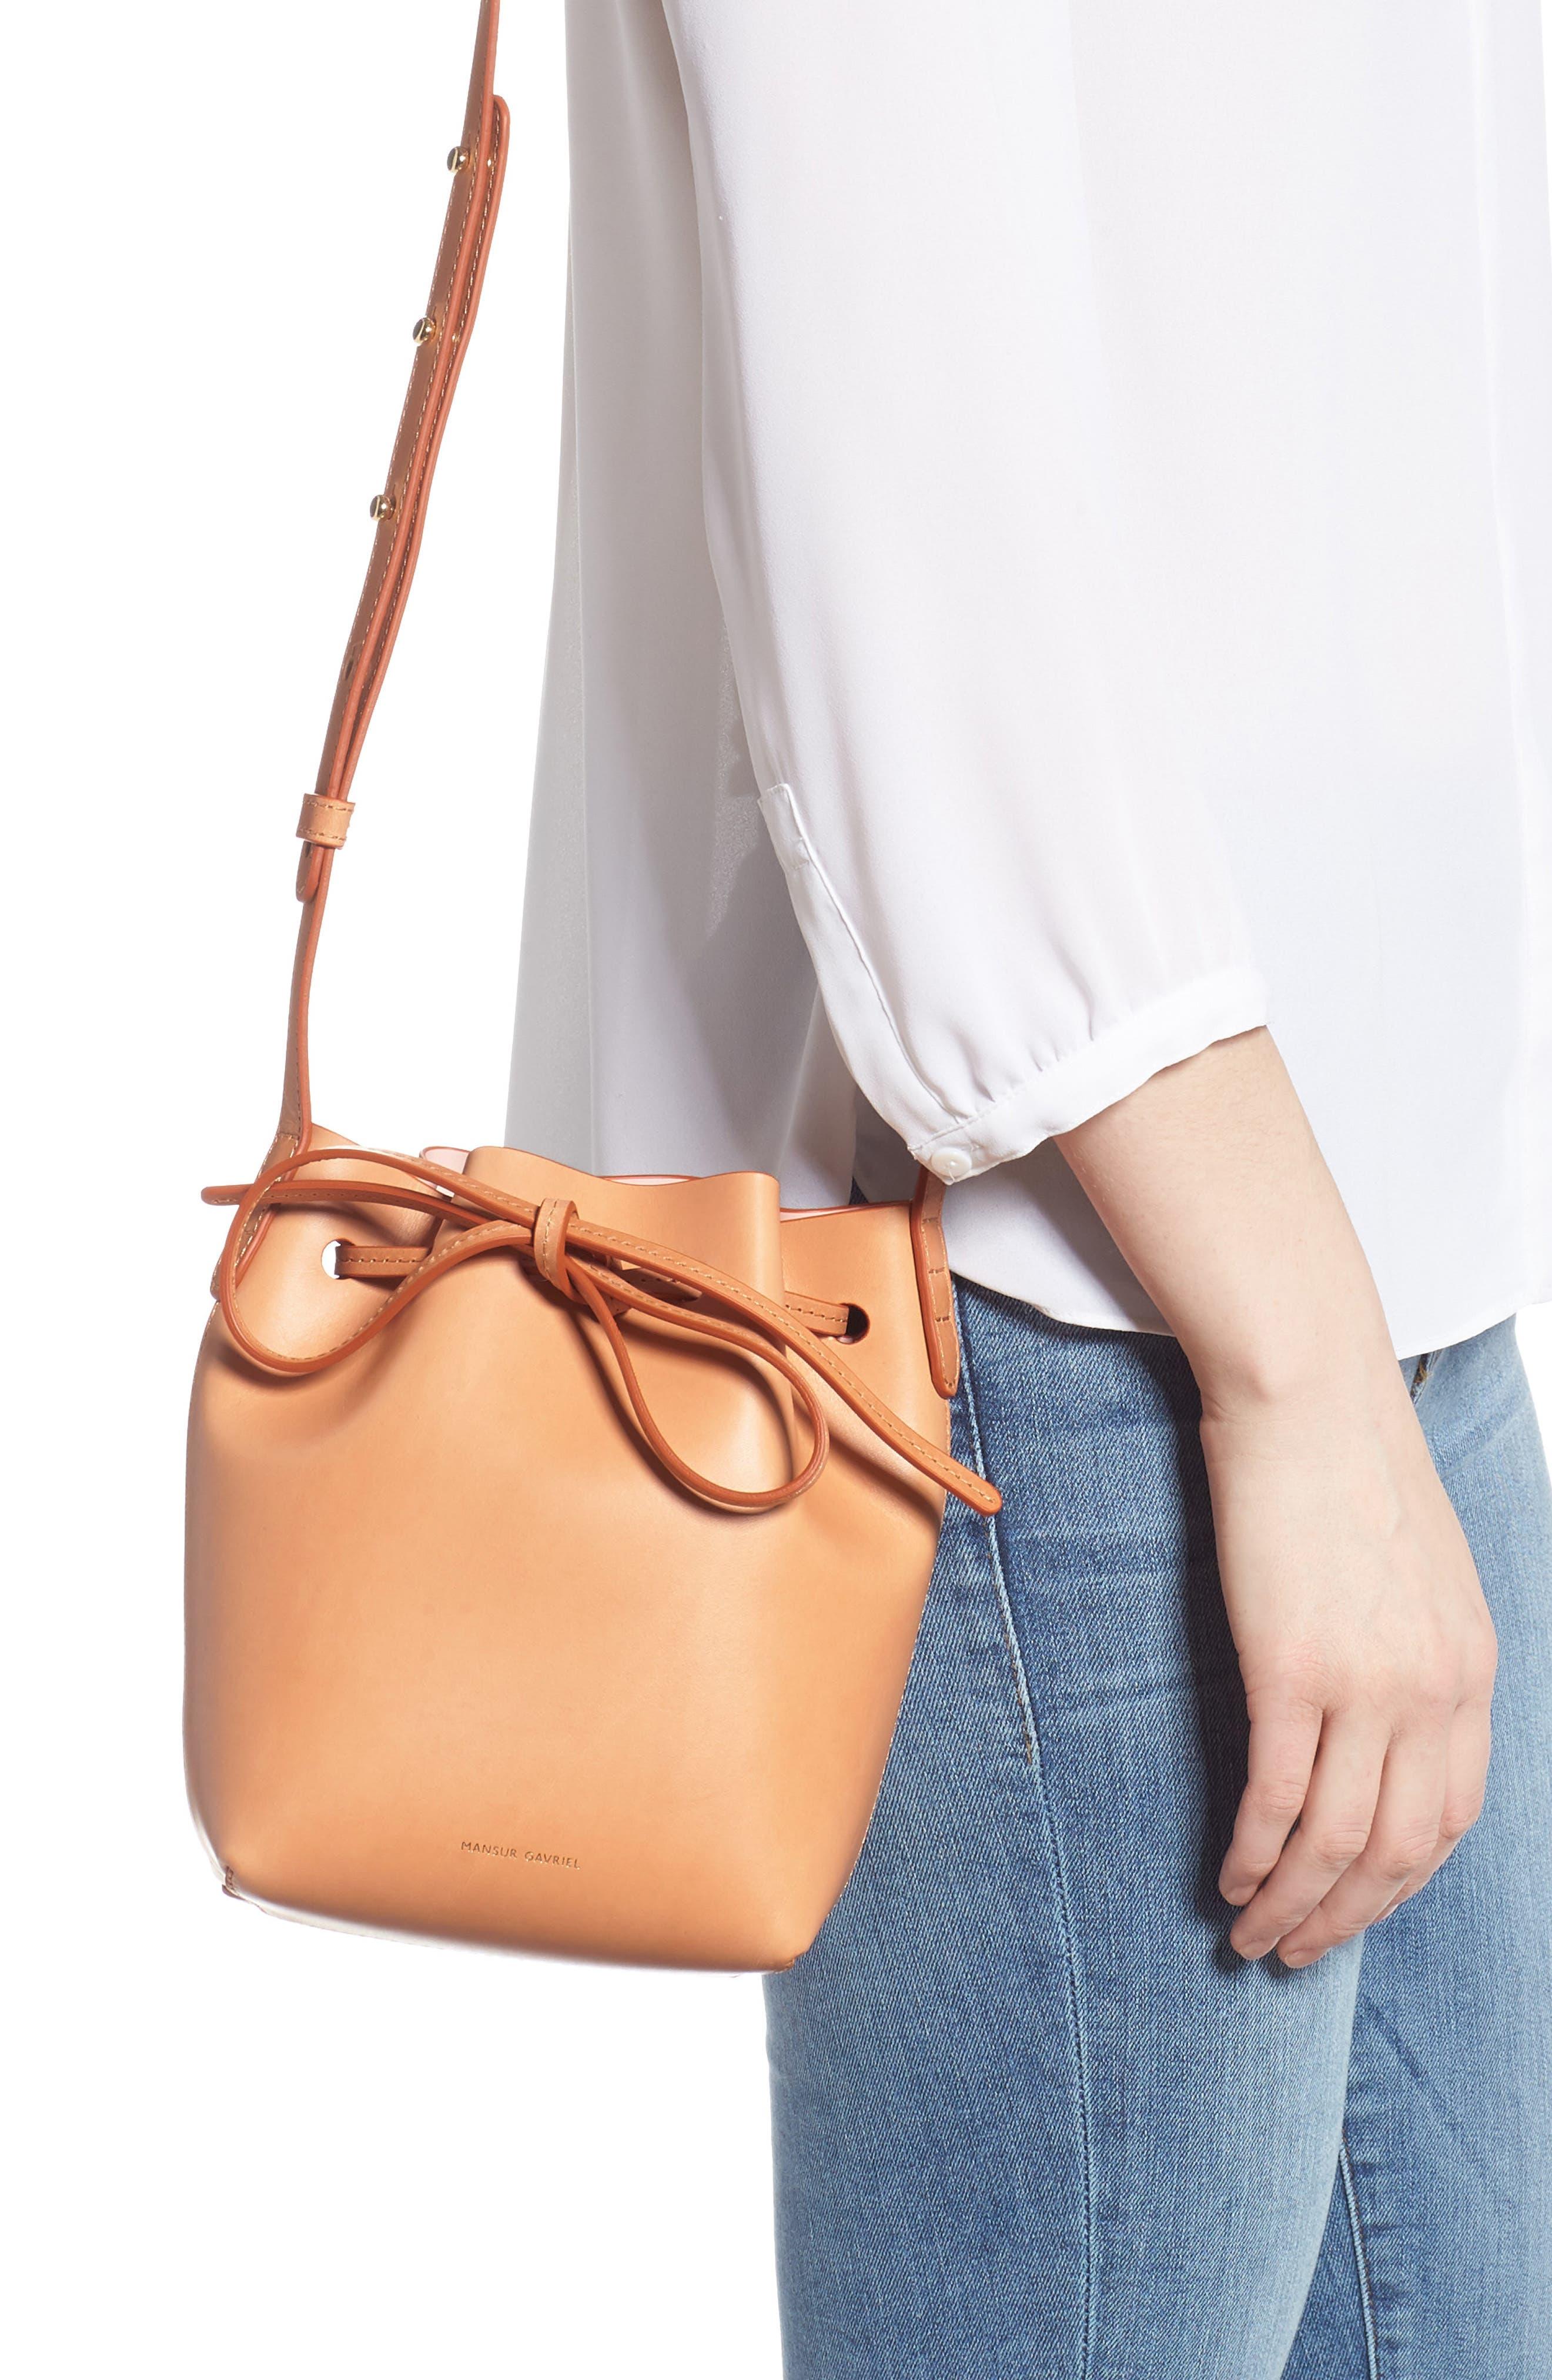 MANSUR GAVRIEL, Mini Mini Leather Bucket Bag, Alternate thumbnail 2, color, CAMMELLO/ ROSA